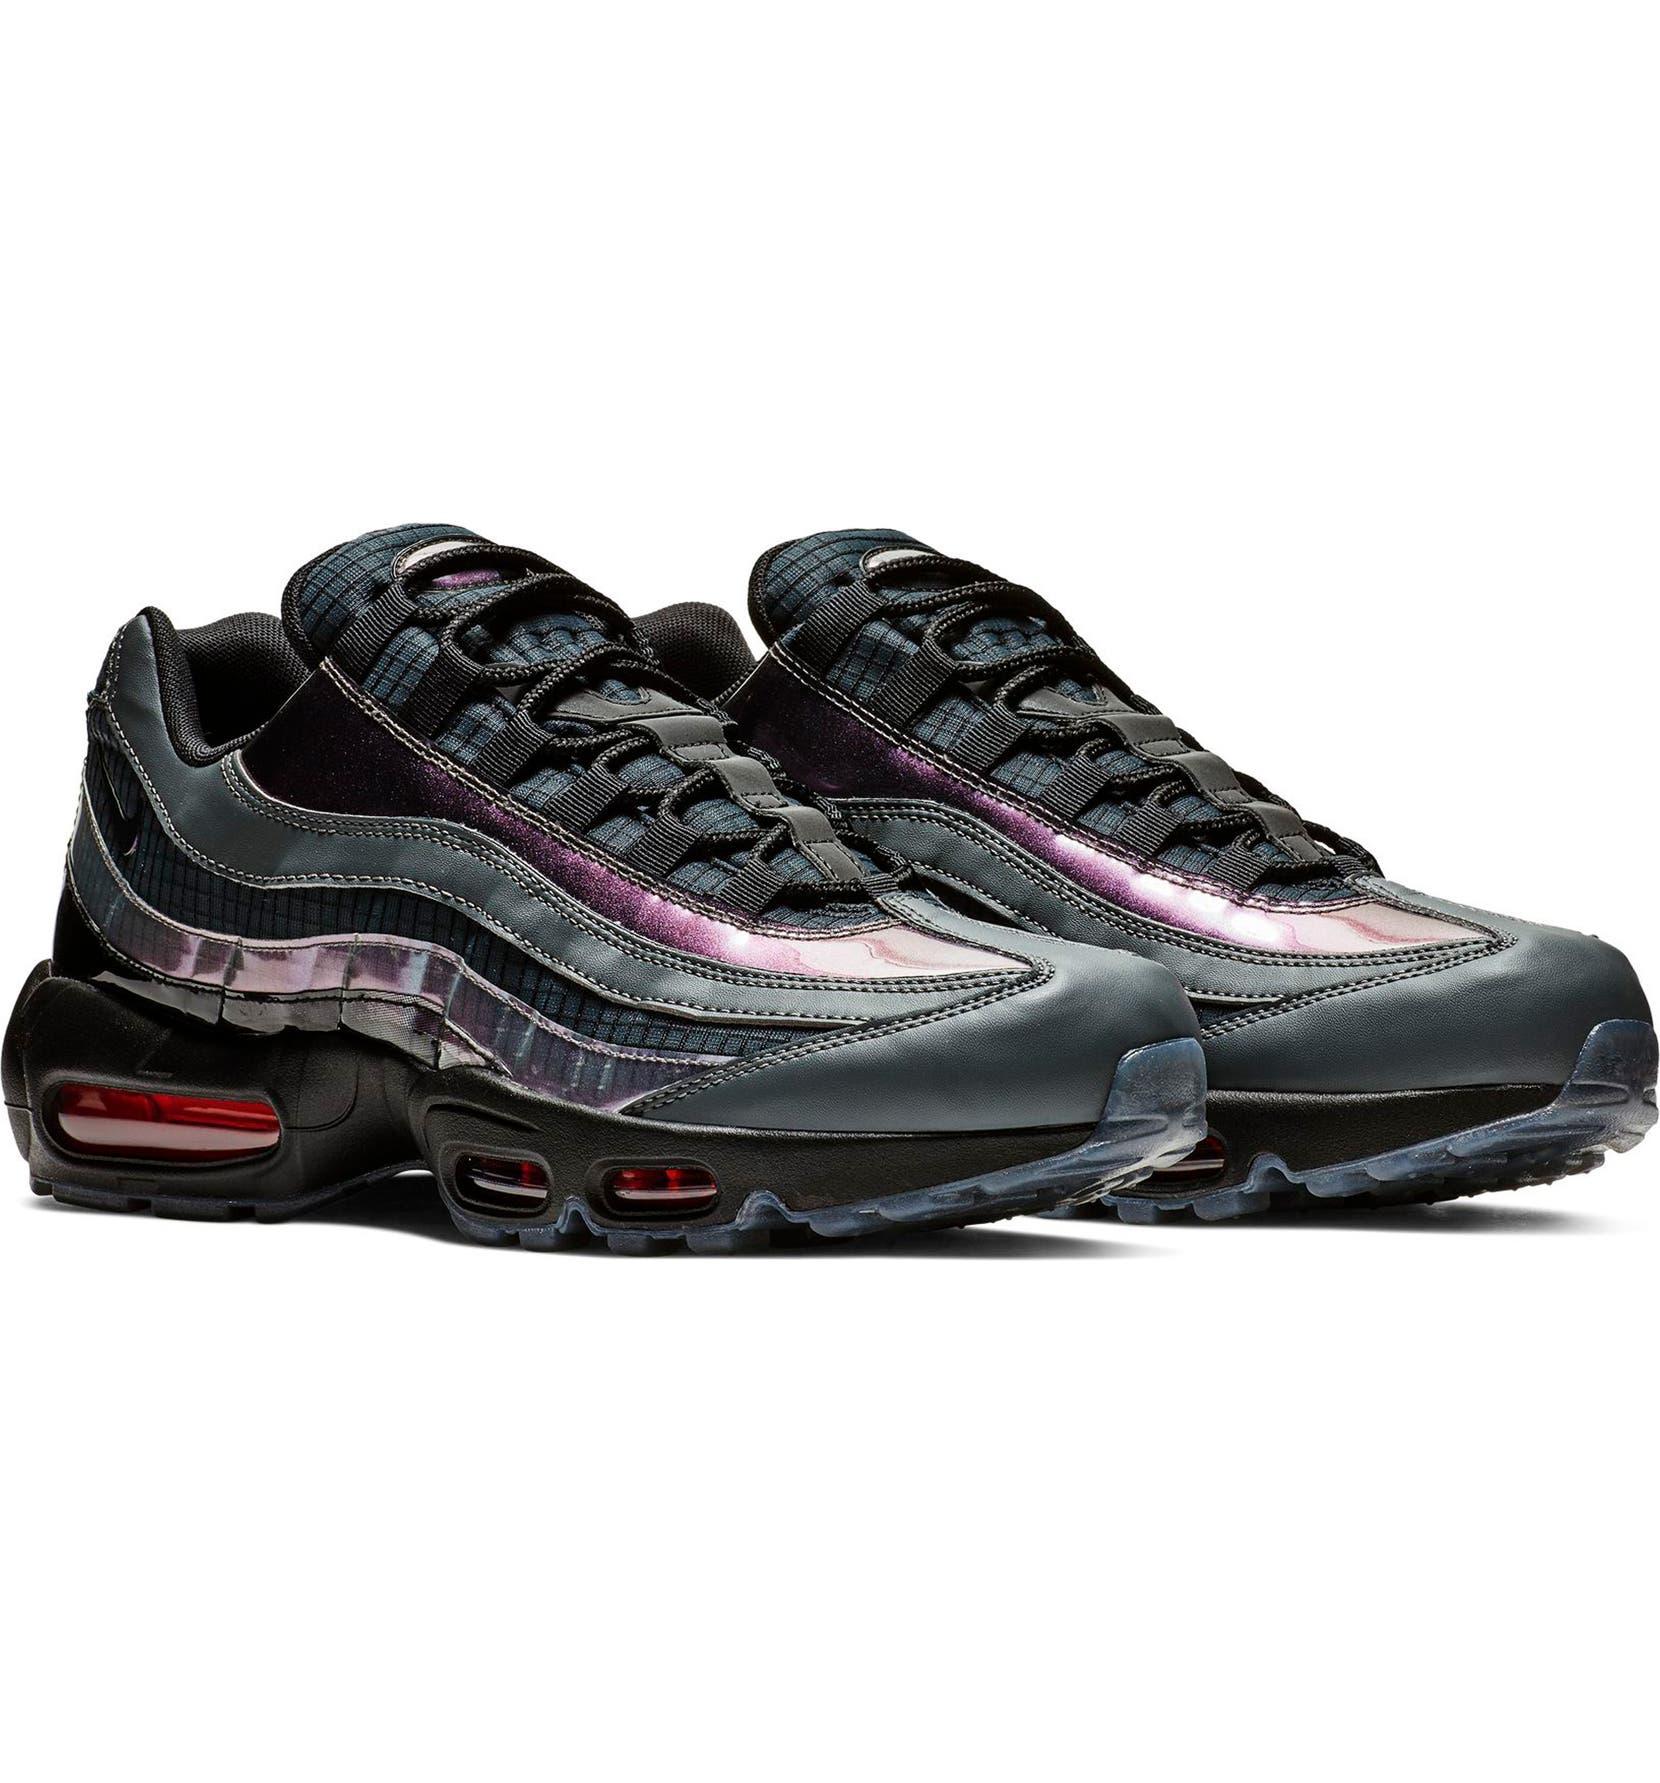 67d85c784b9 Nike Air Max 95 LV8 Sneaker (Unisex)